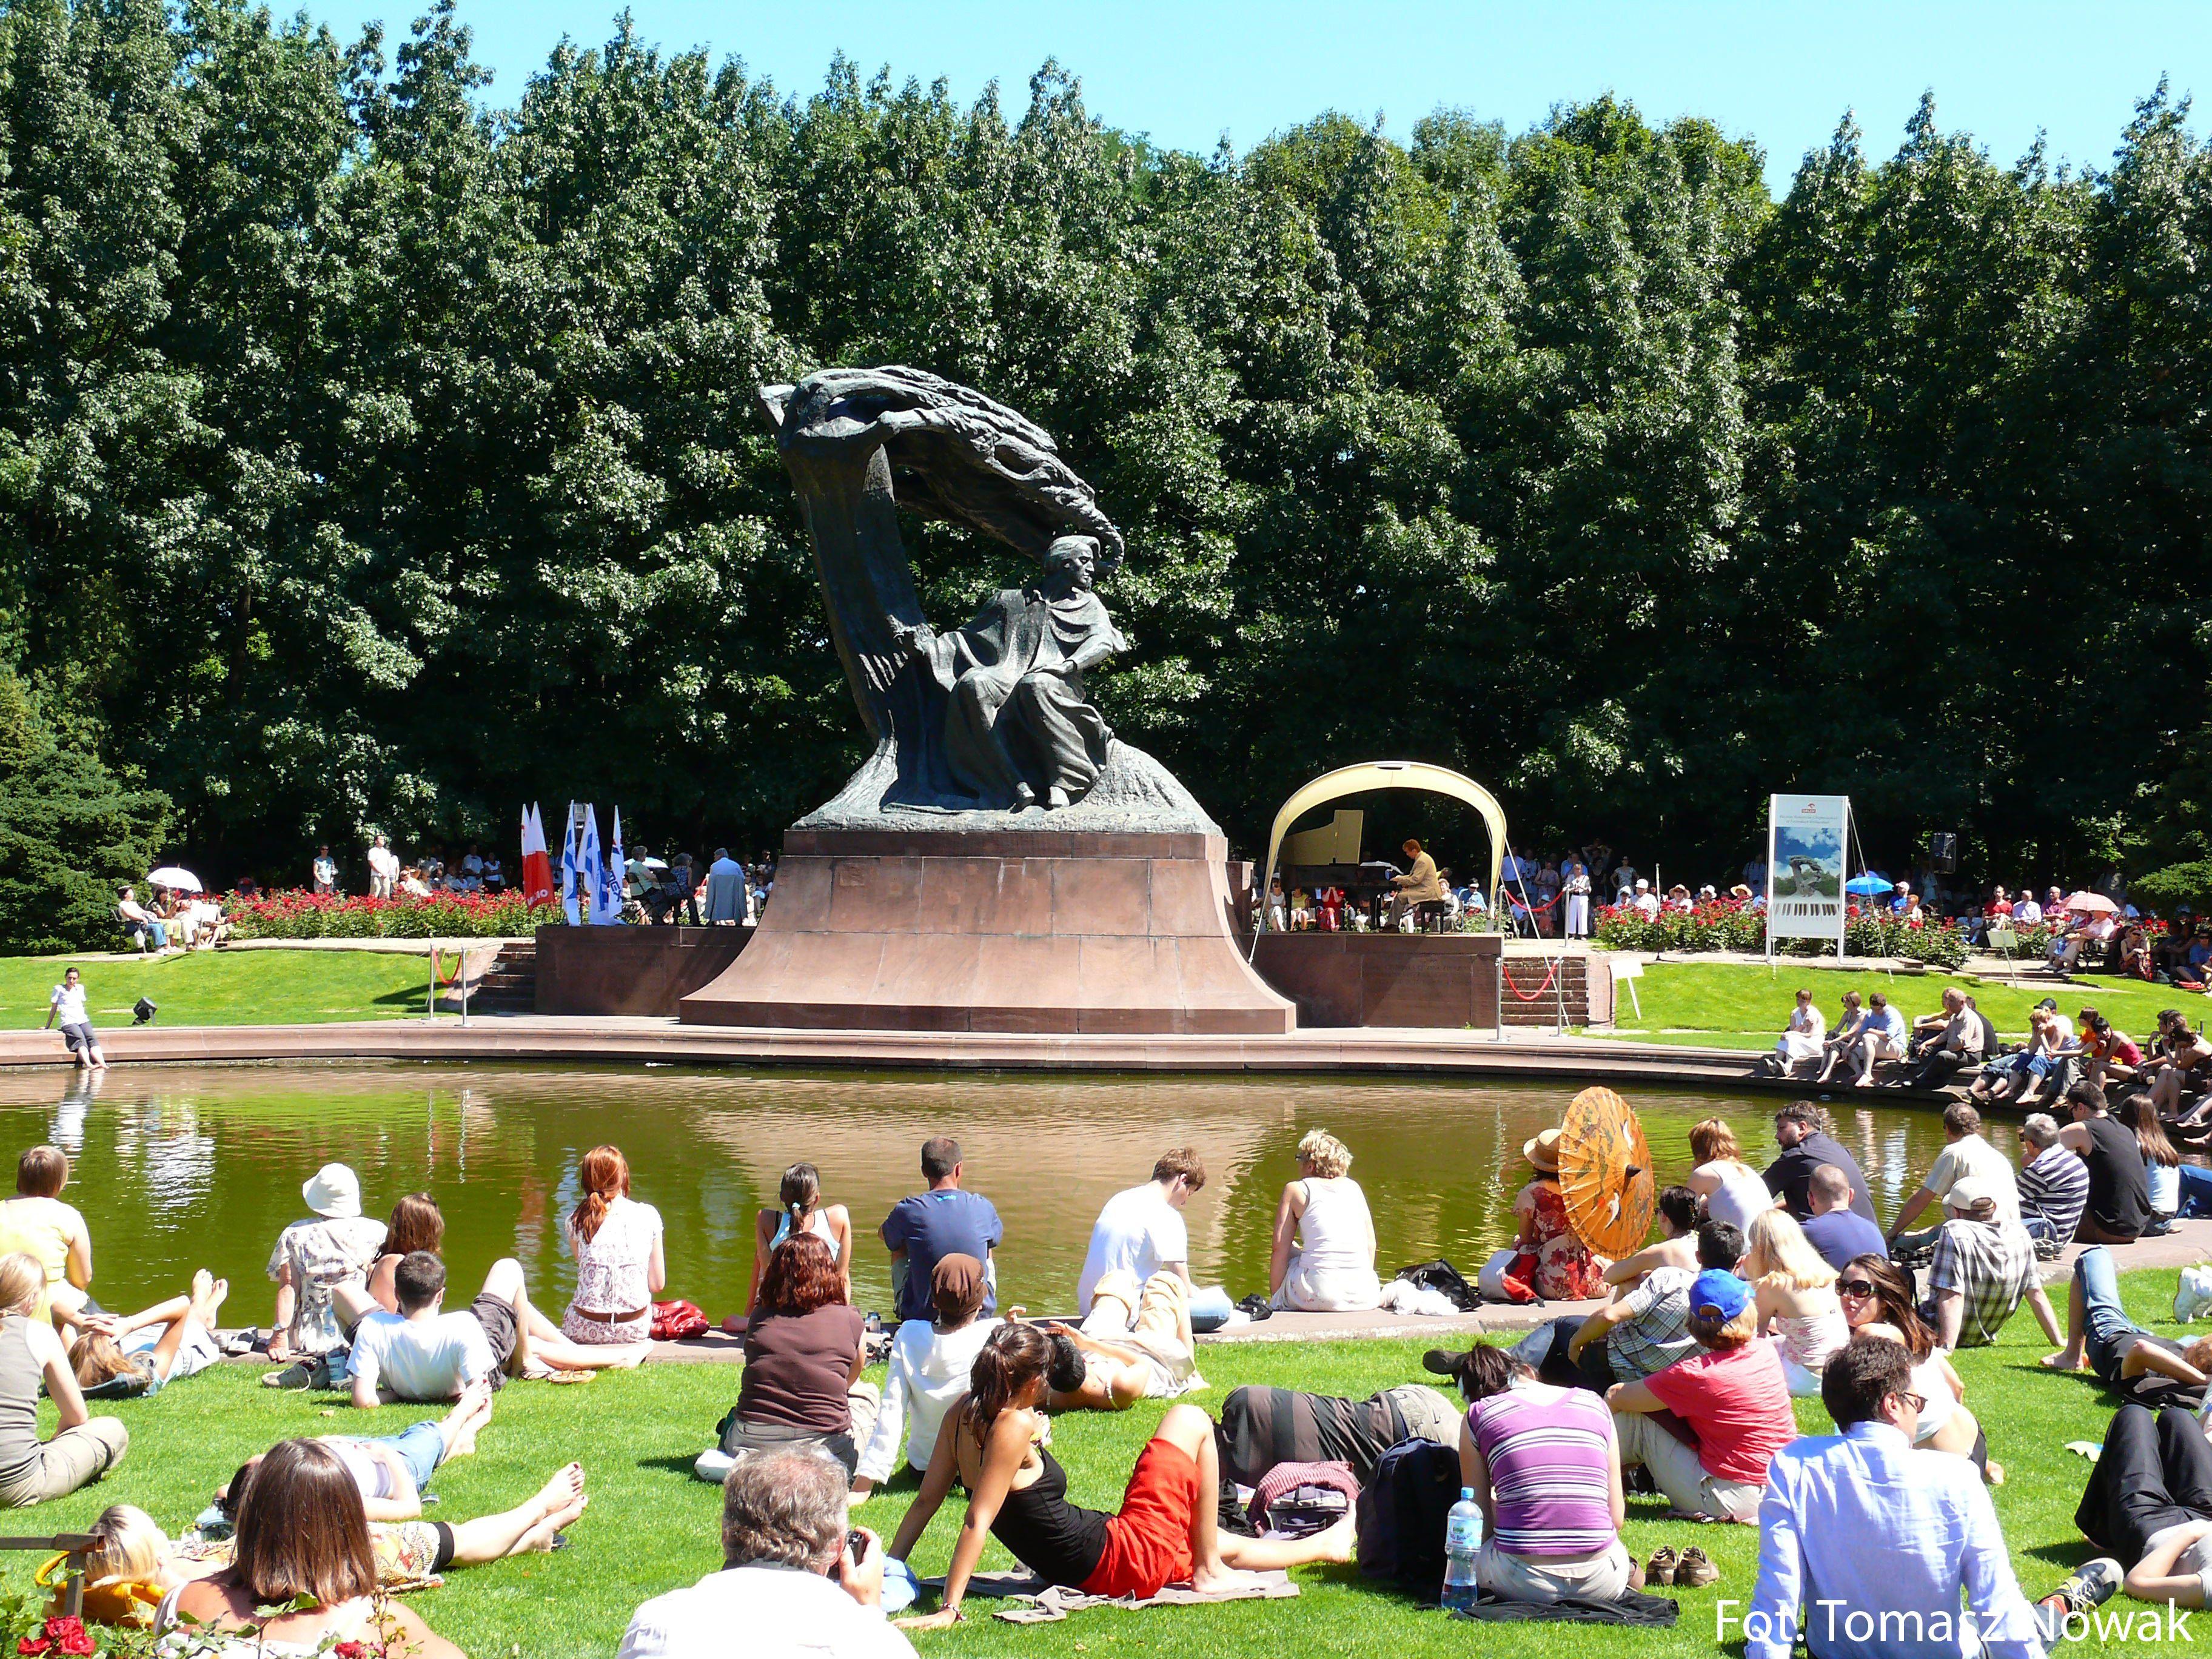 Musik in Warschau – Konzert vor dem Chopin-Denkmal (Foto: Tomasz Nowak, Polnisches Fremdenverkahrsamt)